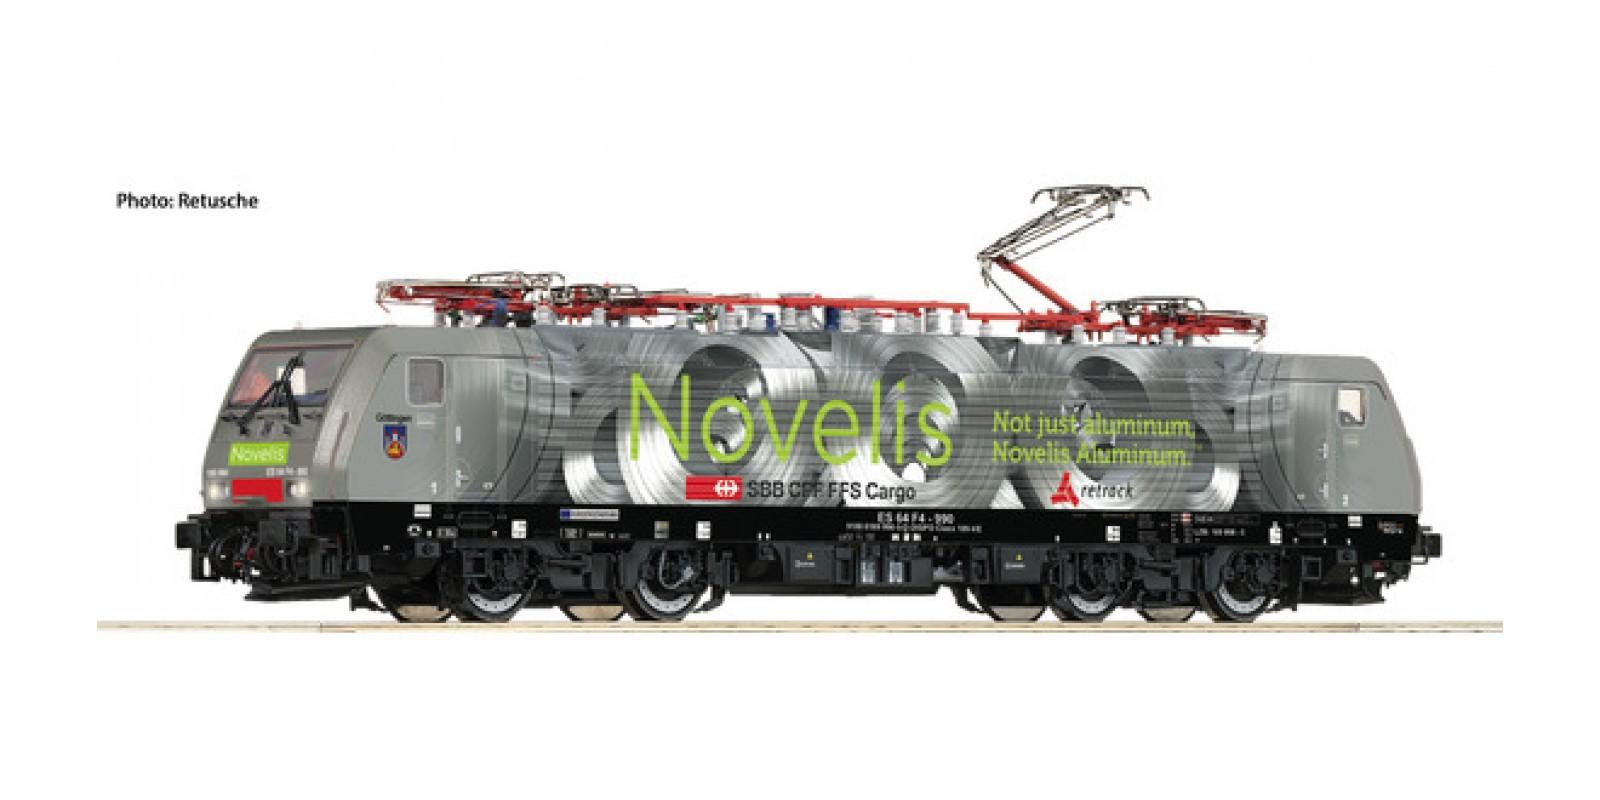 RO73626 - Electric locomotive class 189, MRCE